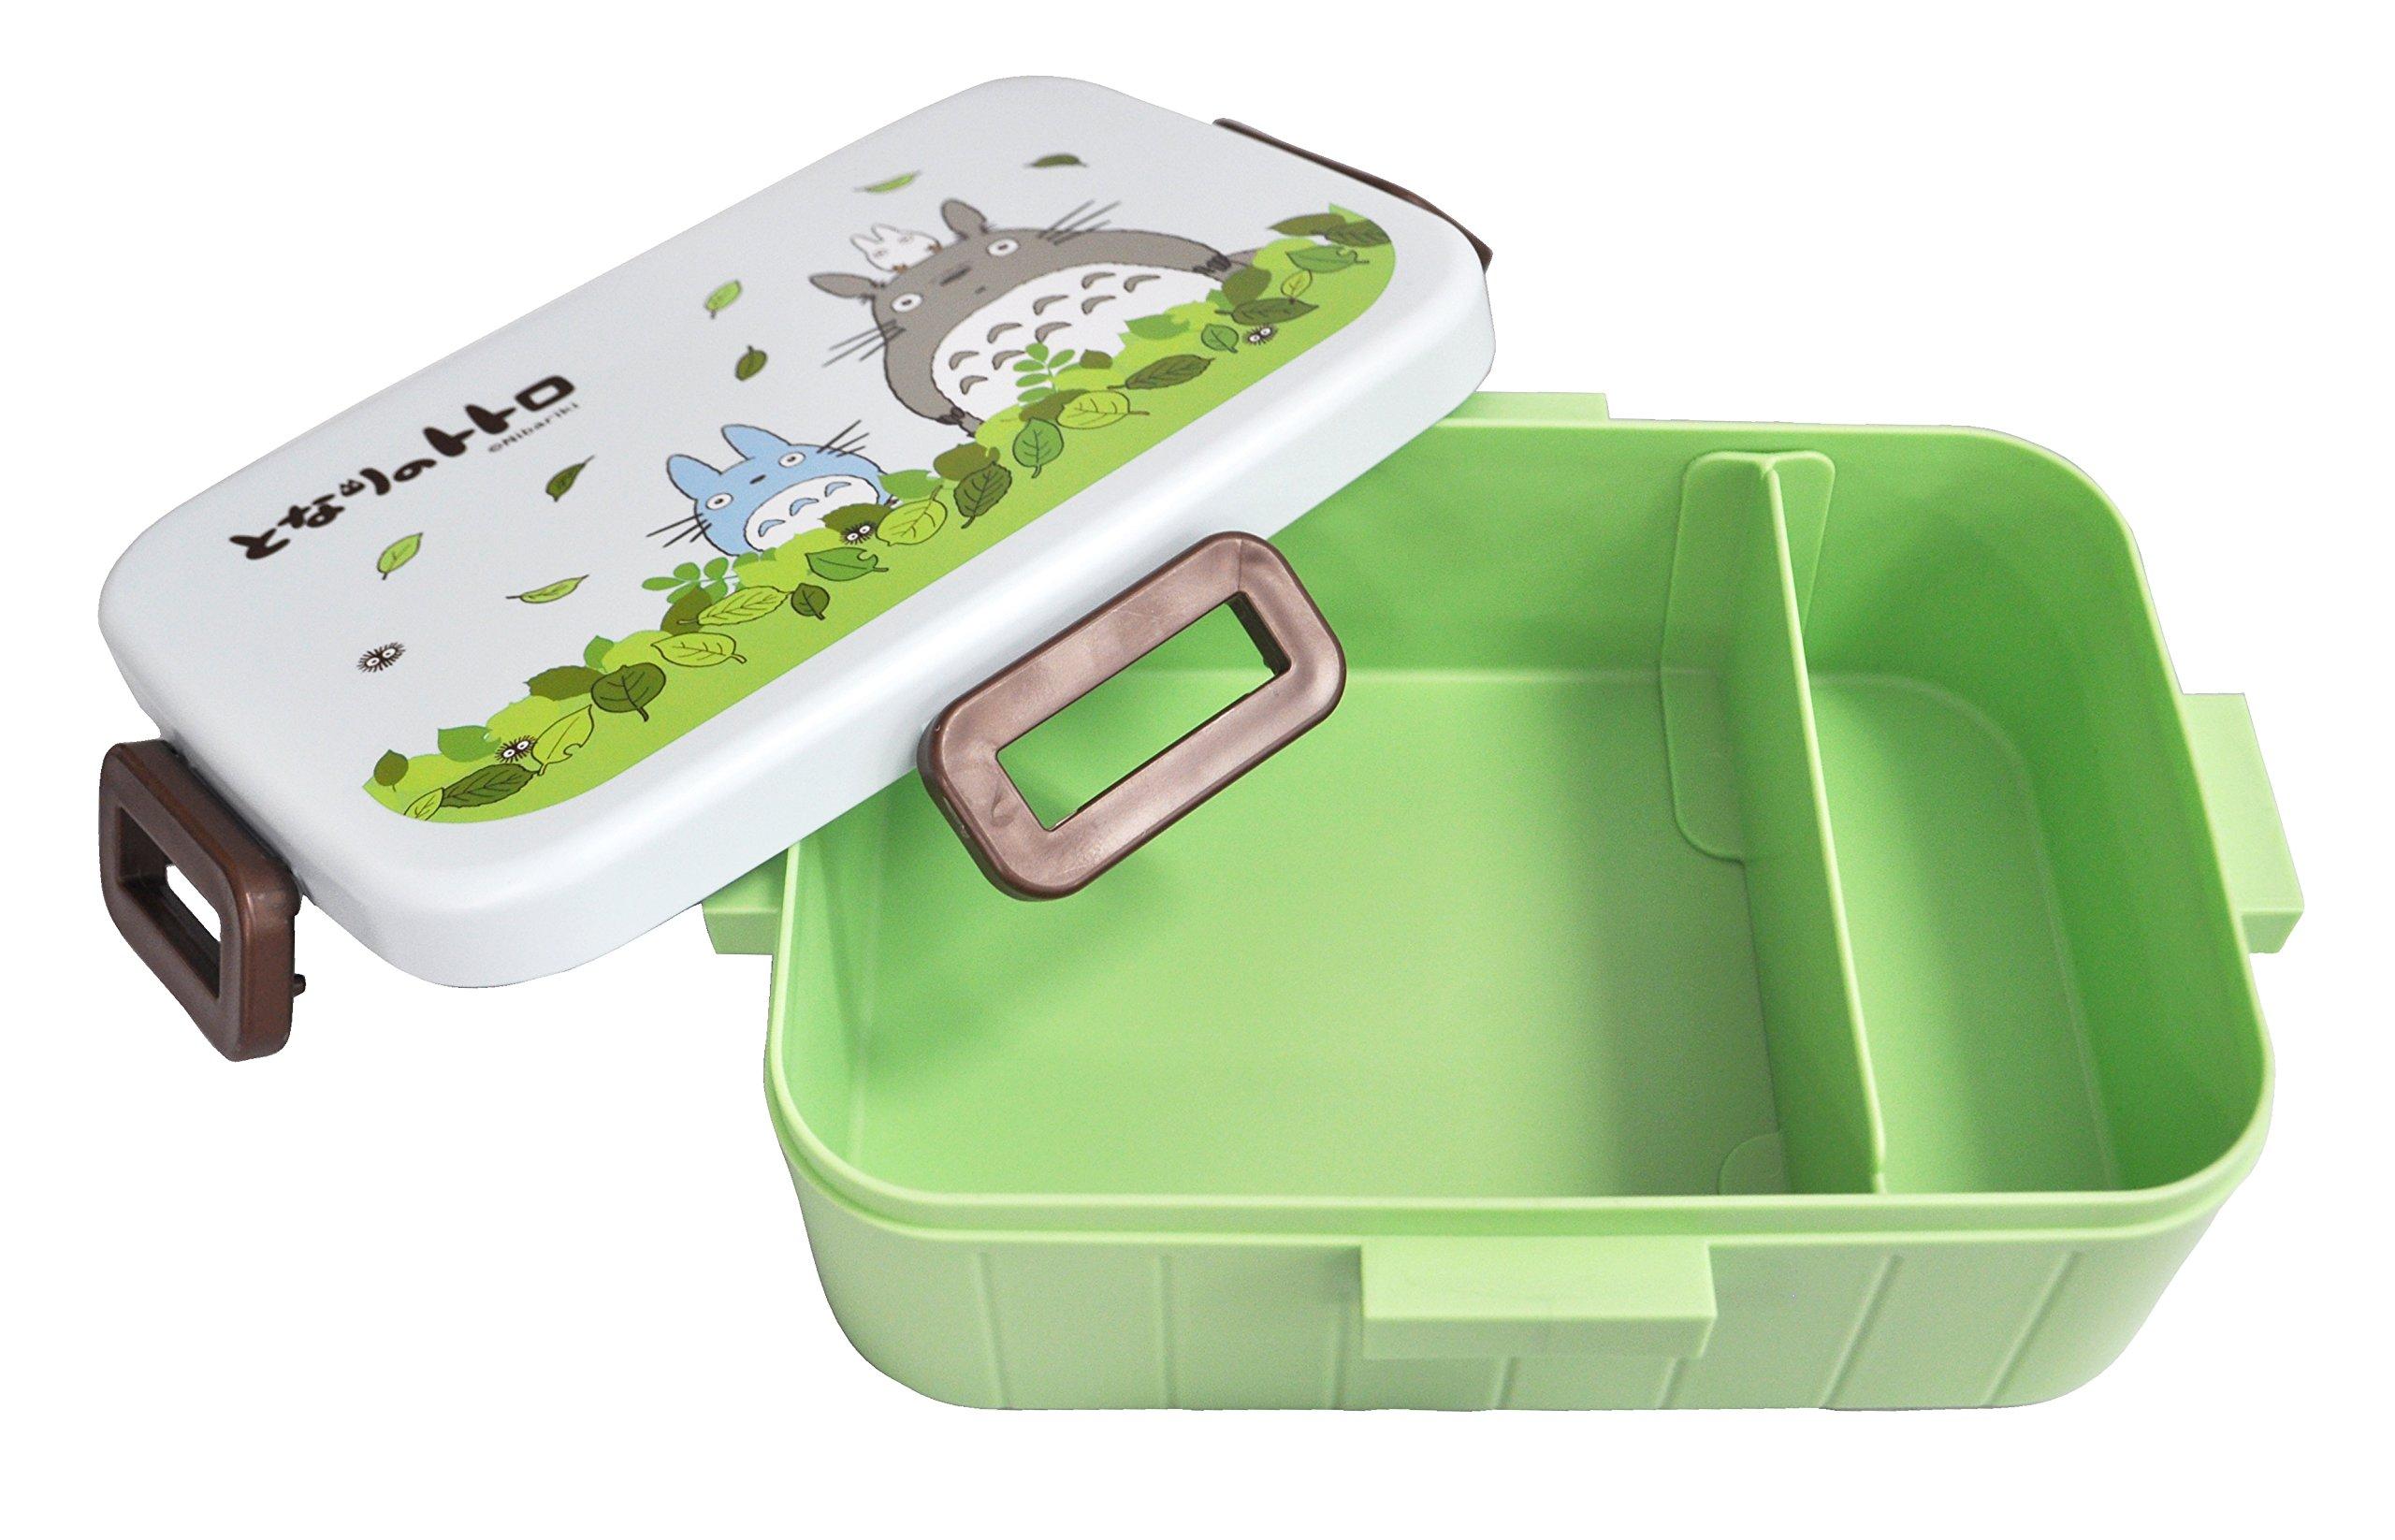 Bento: Studio Ghibli Totoro Design Microwavable Bento Lunch Box (900ml)